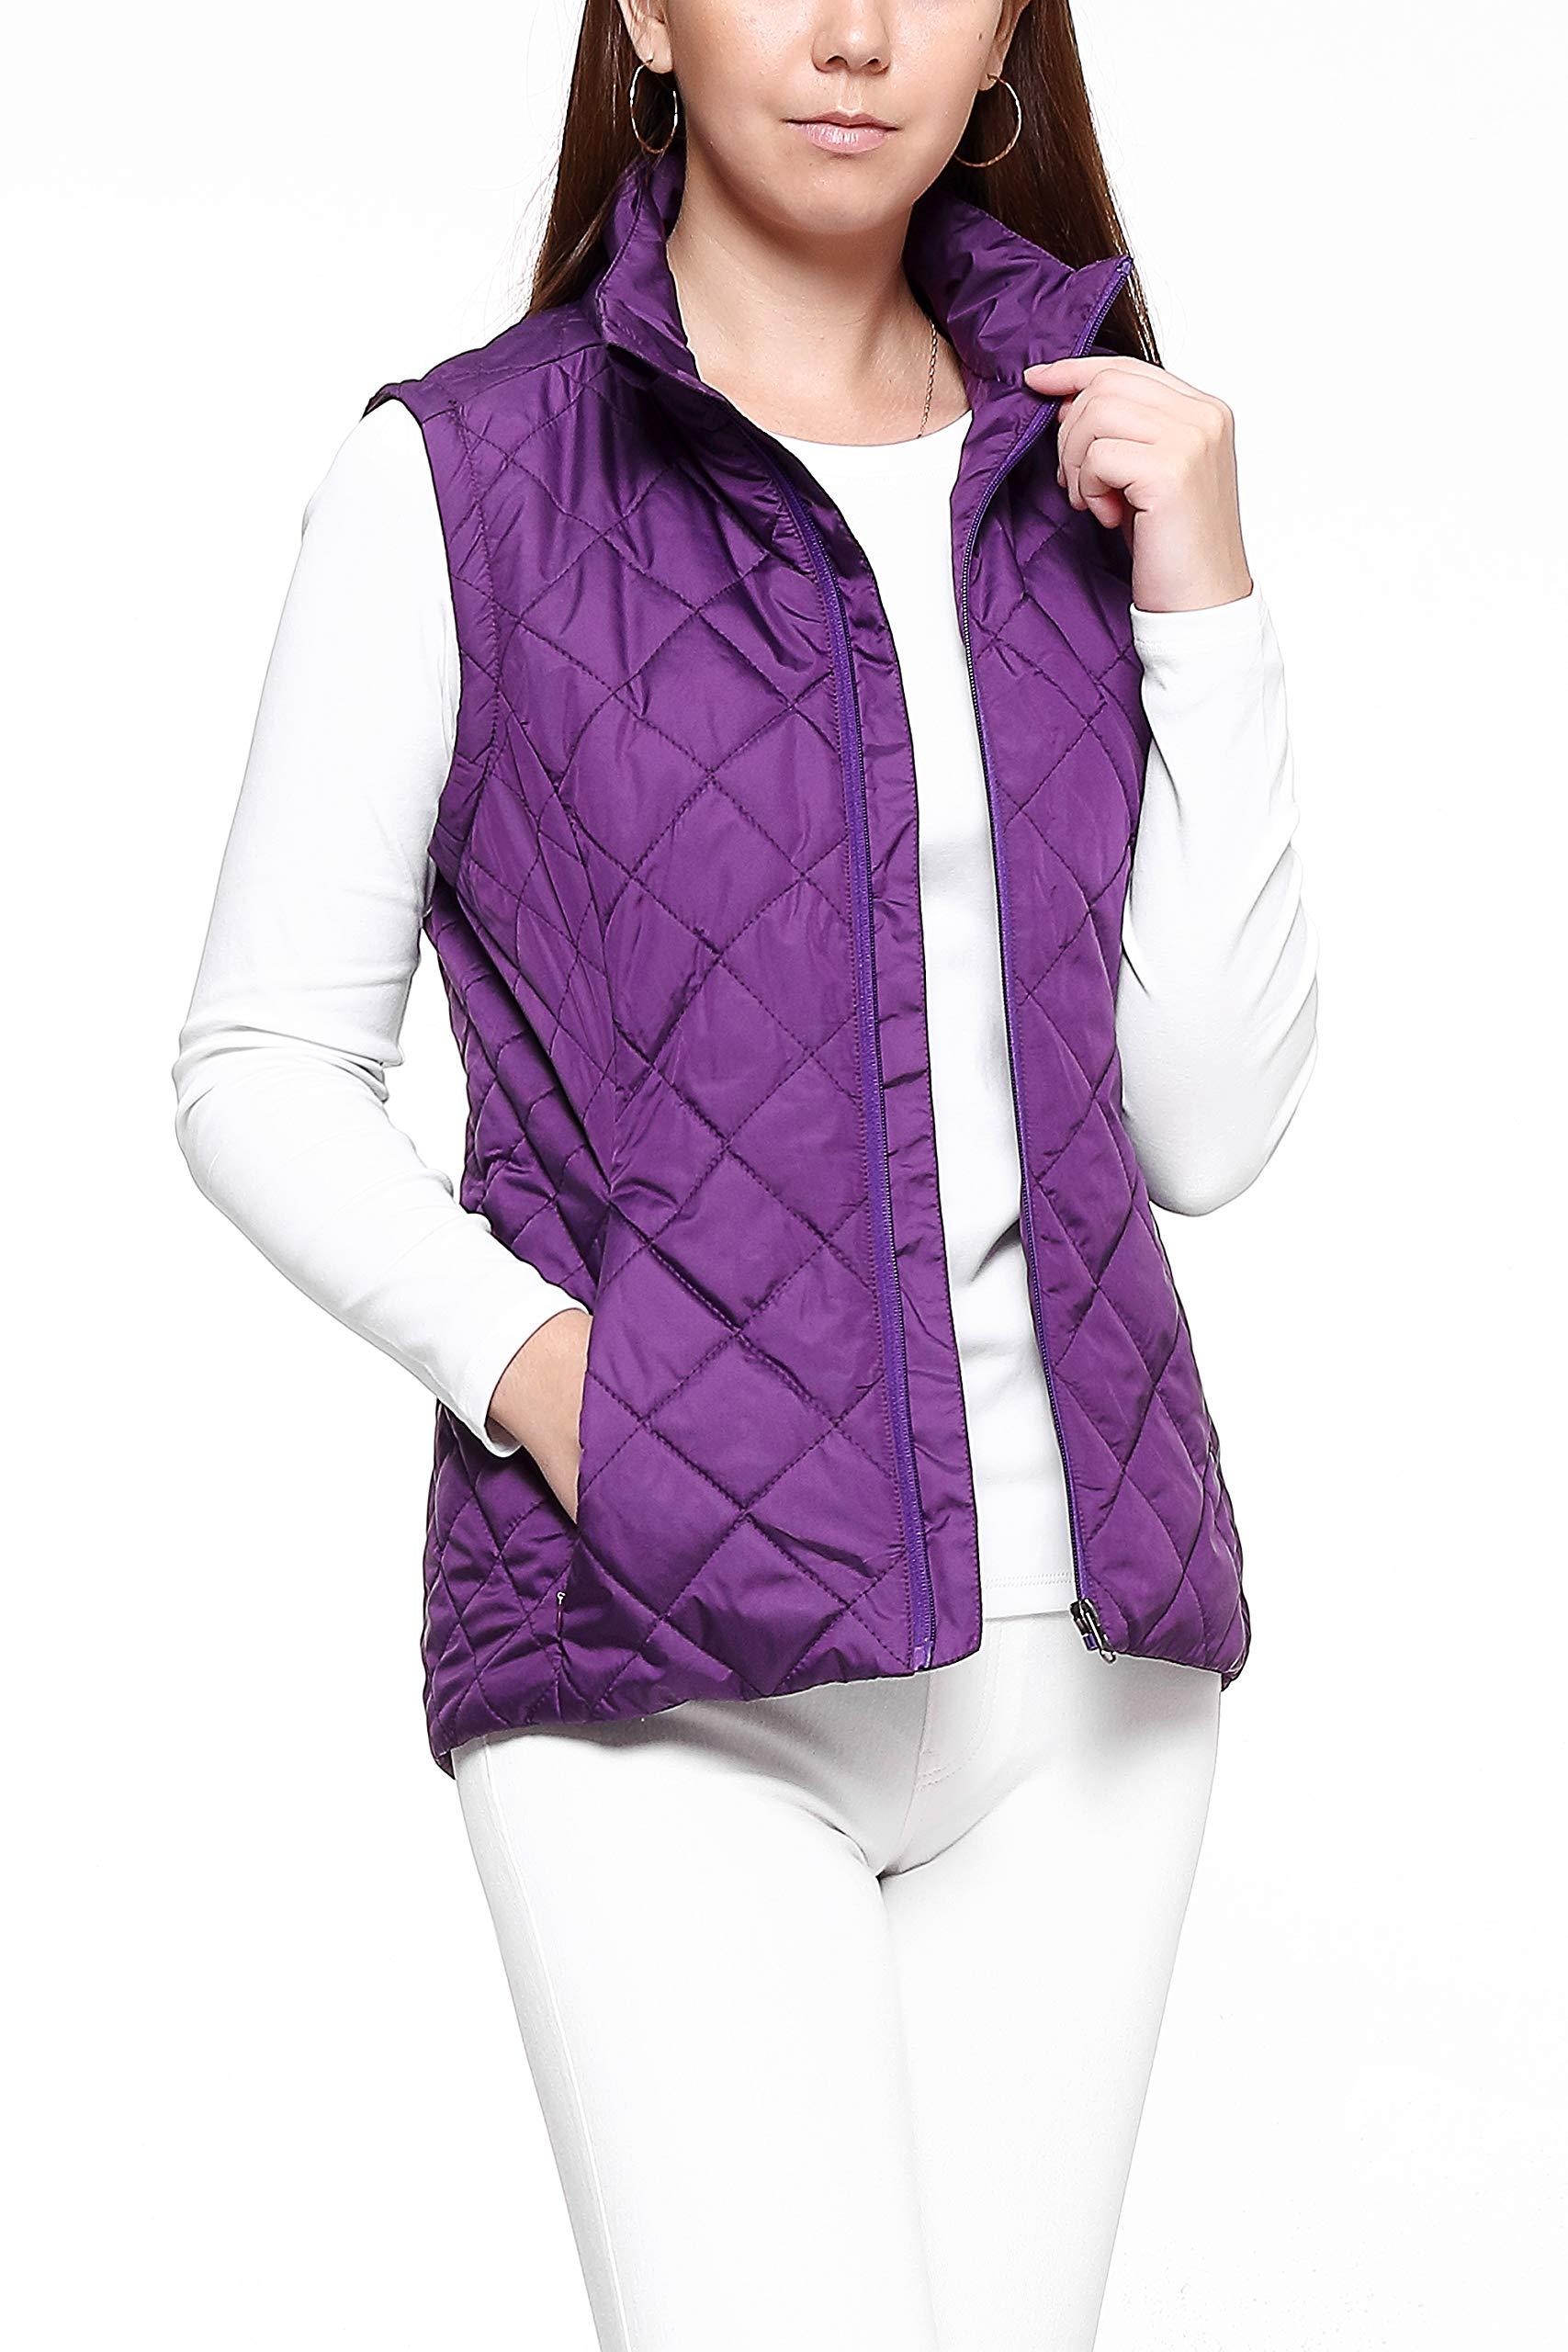 More Golooper Lightweight Quilted Women's Vest (Purple, XL)